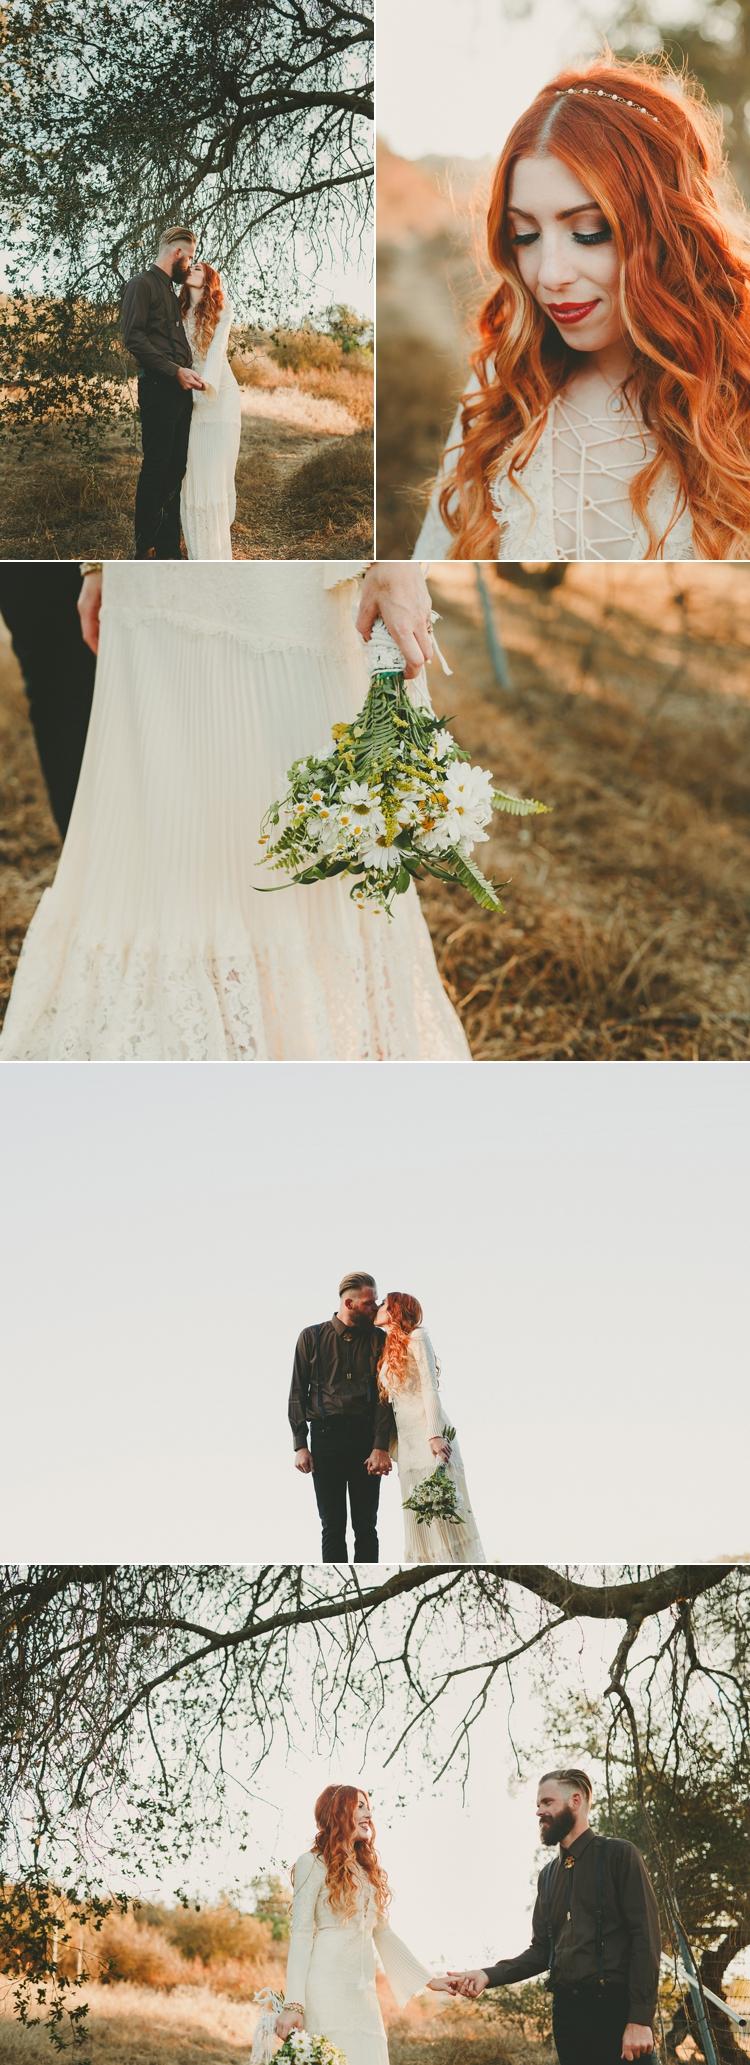 woodstock-inspired-wedding-photos-23